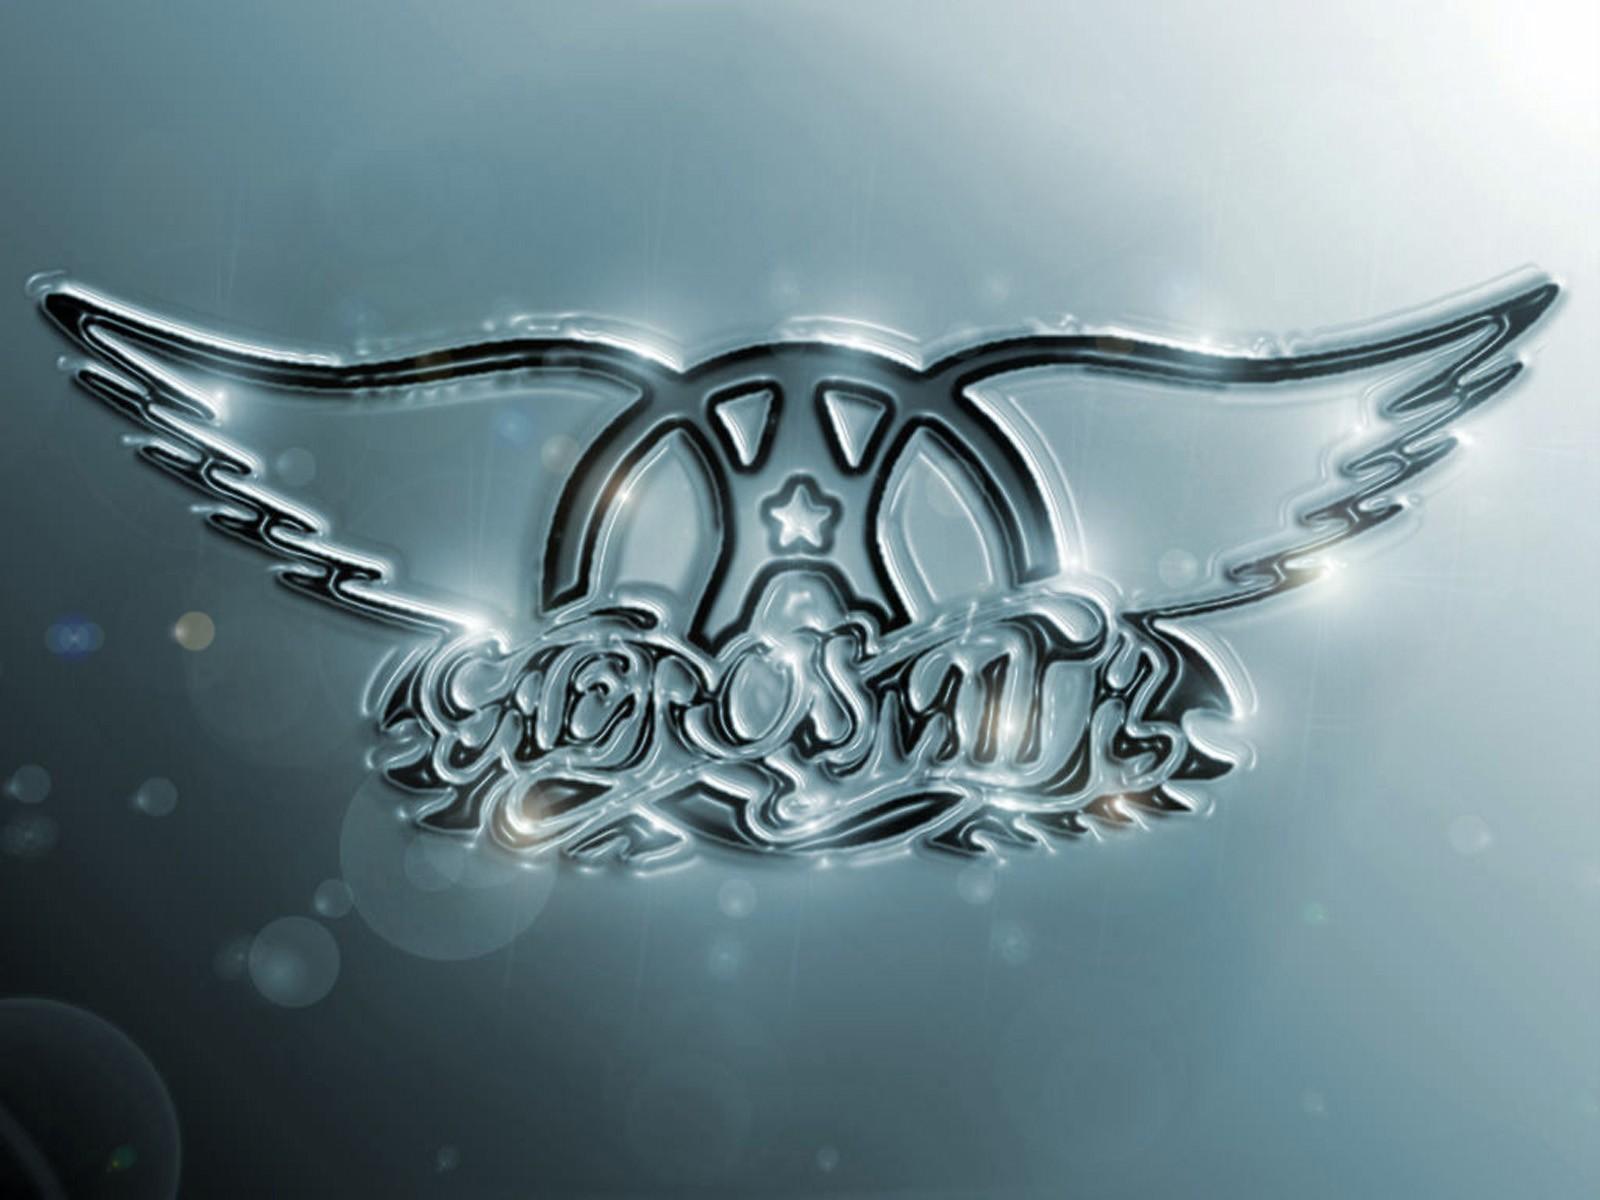 Aerosmith Logo Wallpaper